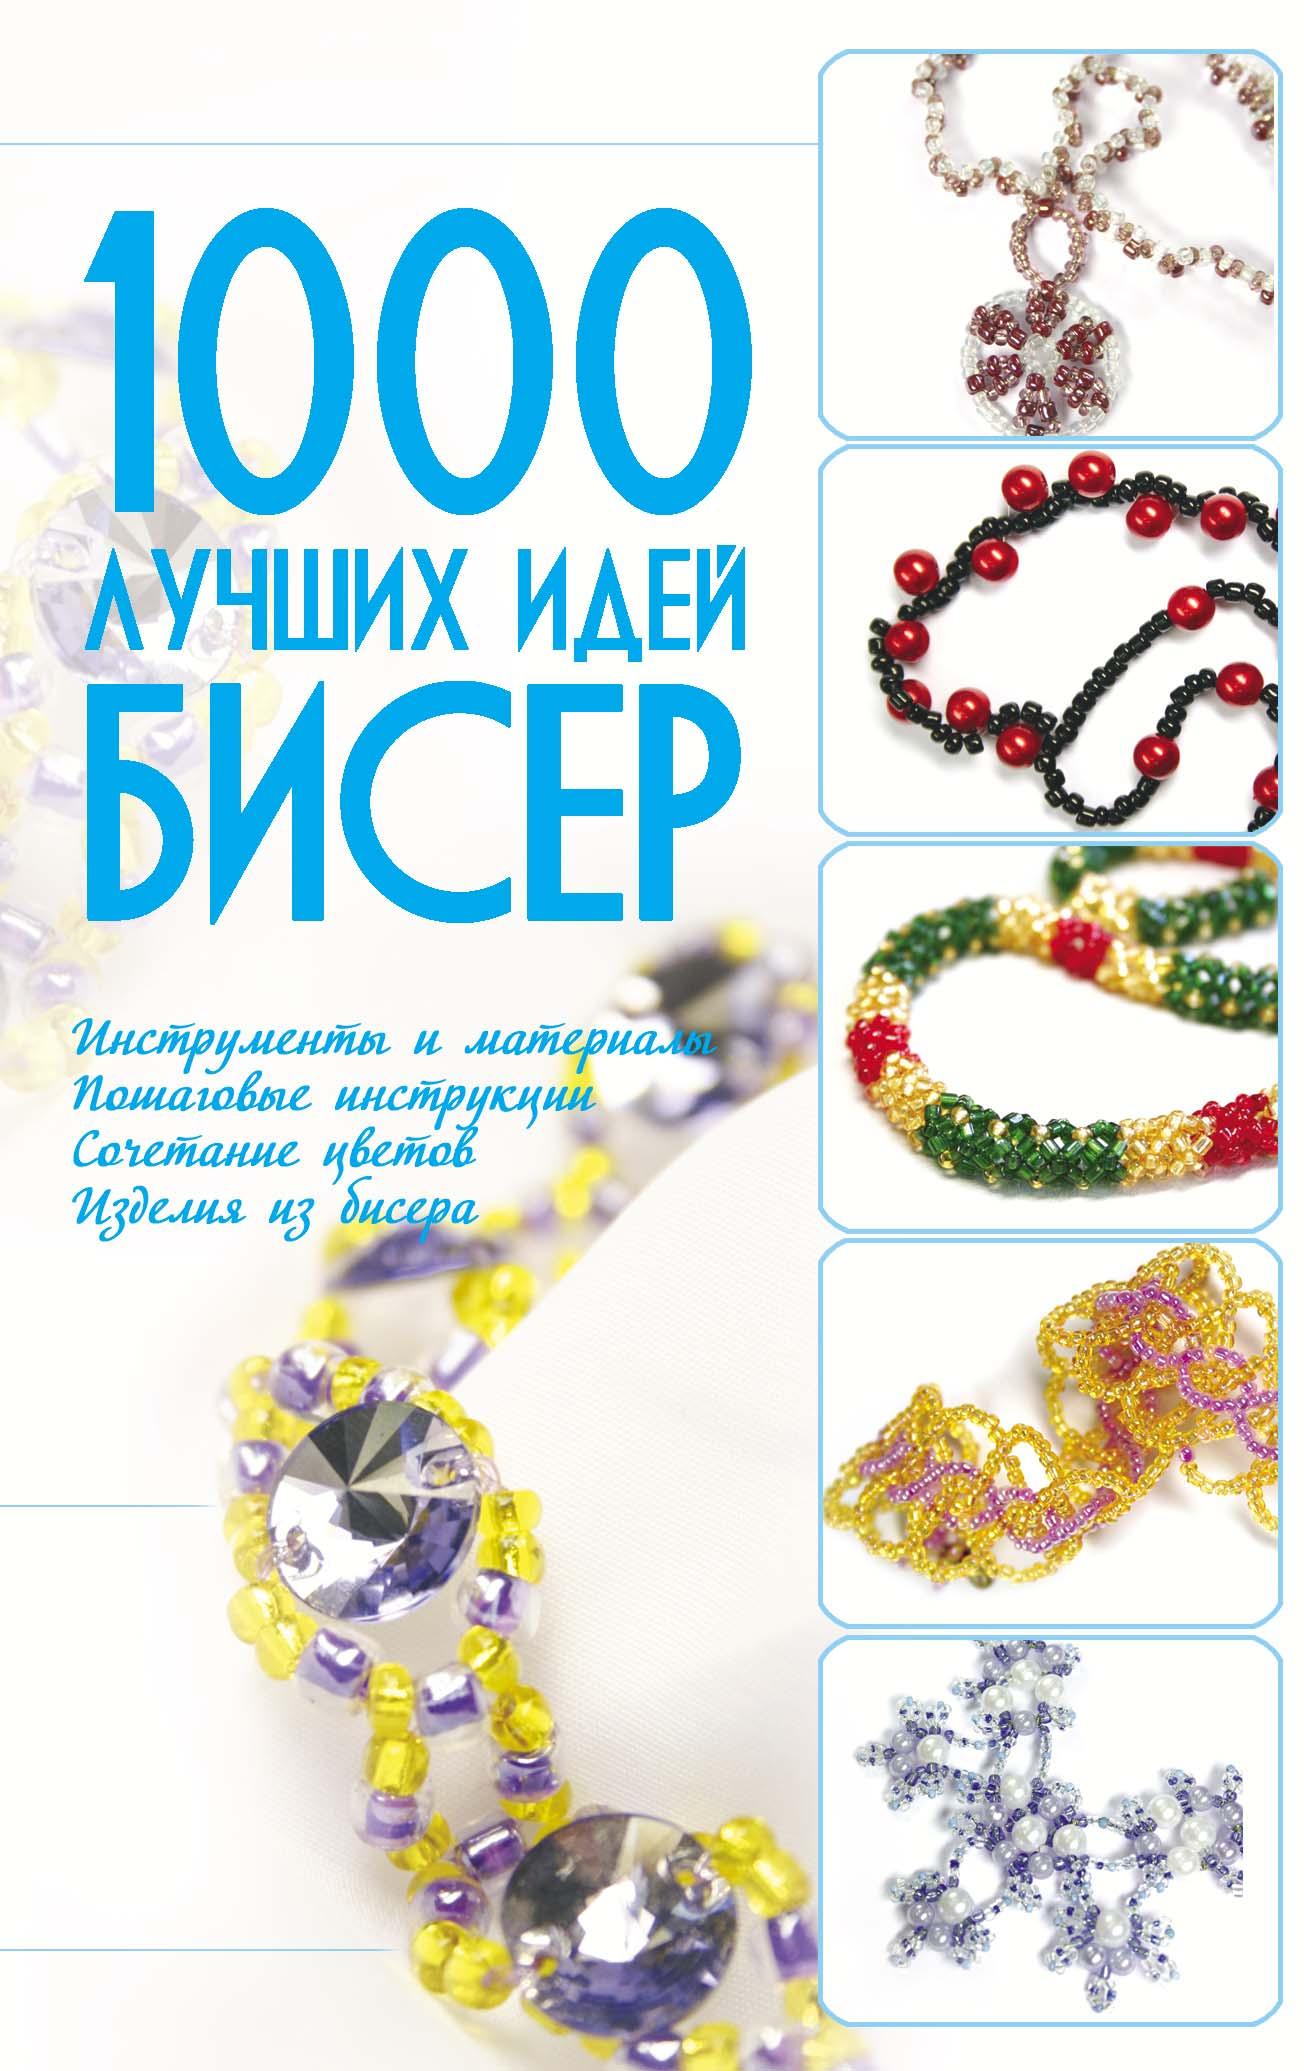 Анна Мурзина Бисер. 1000 лучших идей анна мурзина бисер 1000 лучших идей